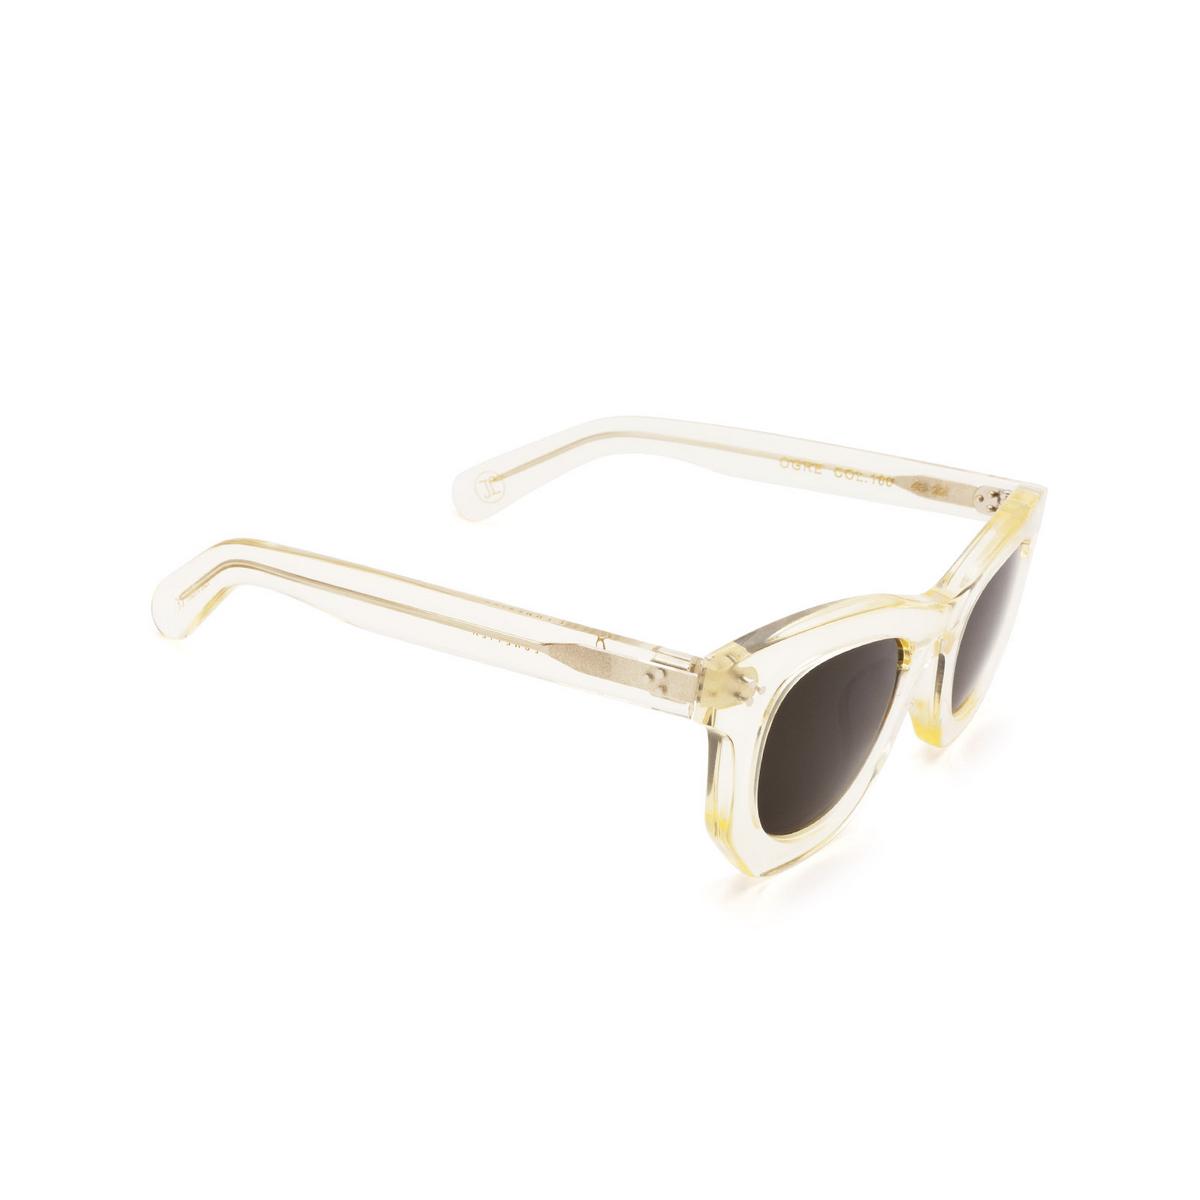 Lesca® Irregular Sunglasses: Ogre Sun color Champagne 186 - three-quarters view.